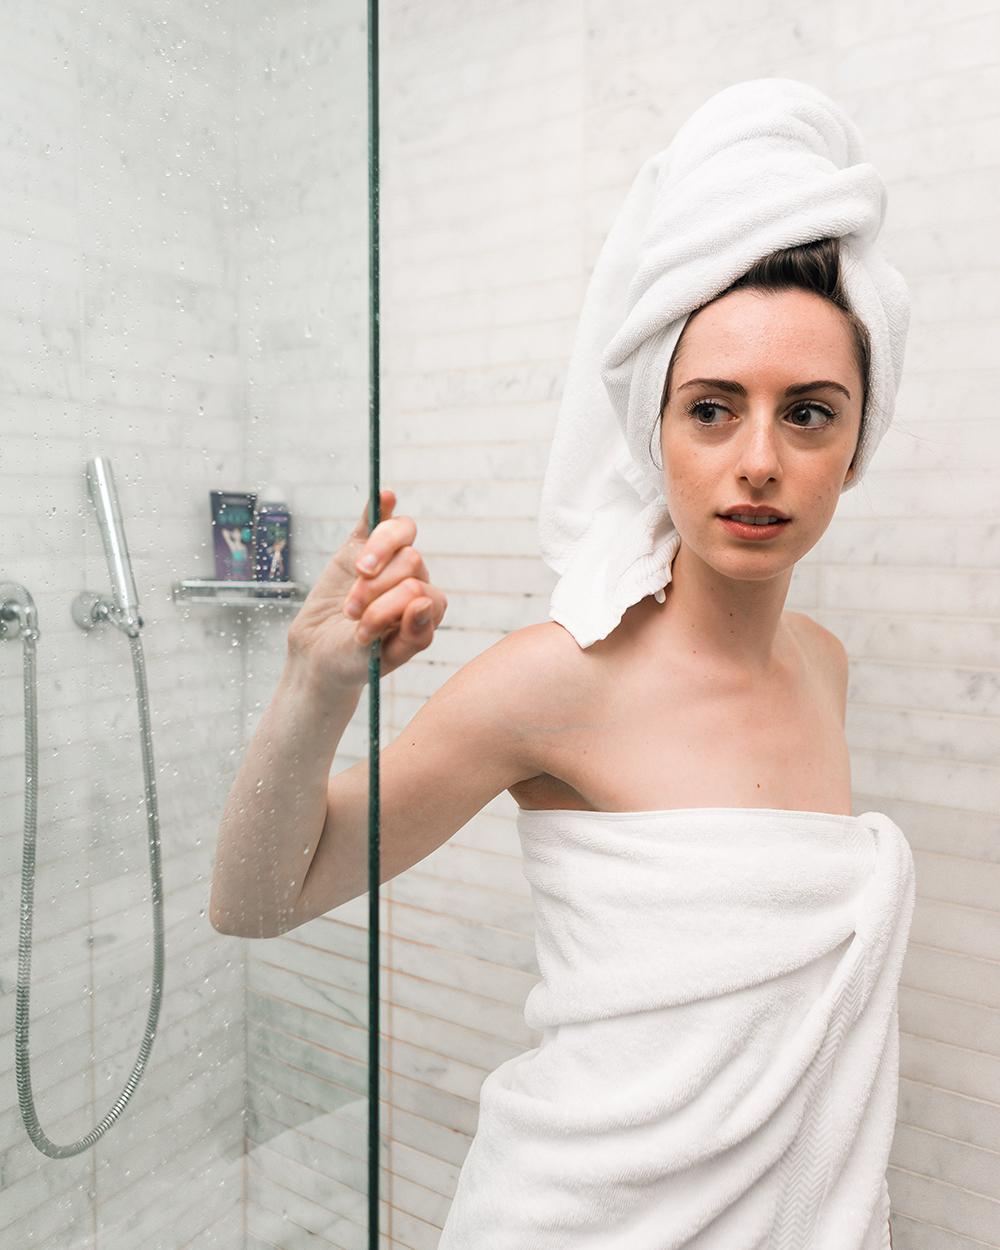 tắm chống lão hóa